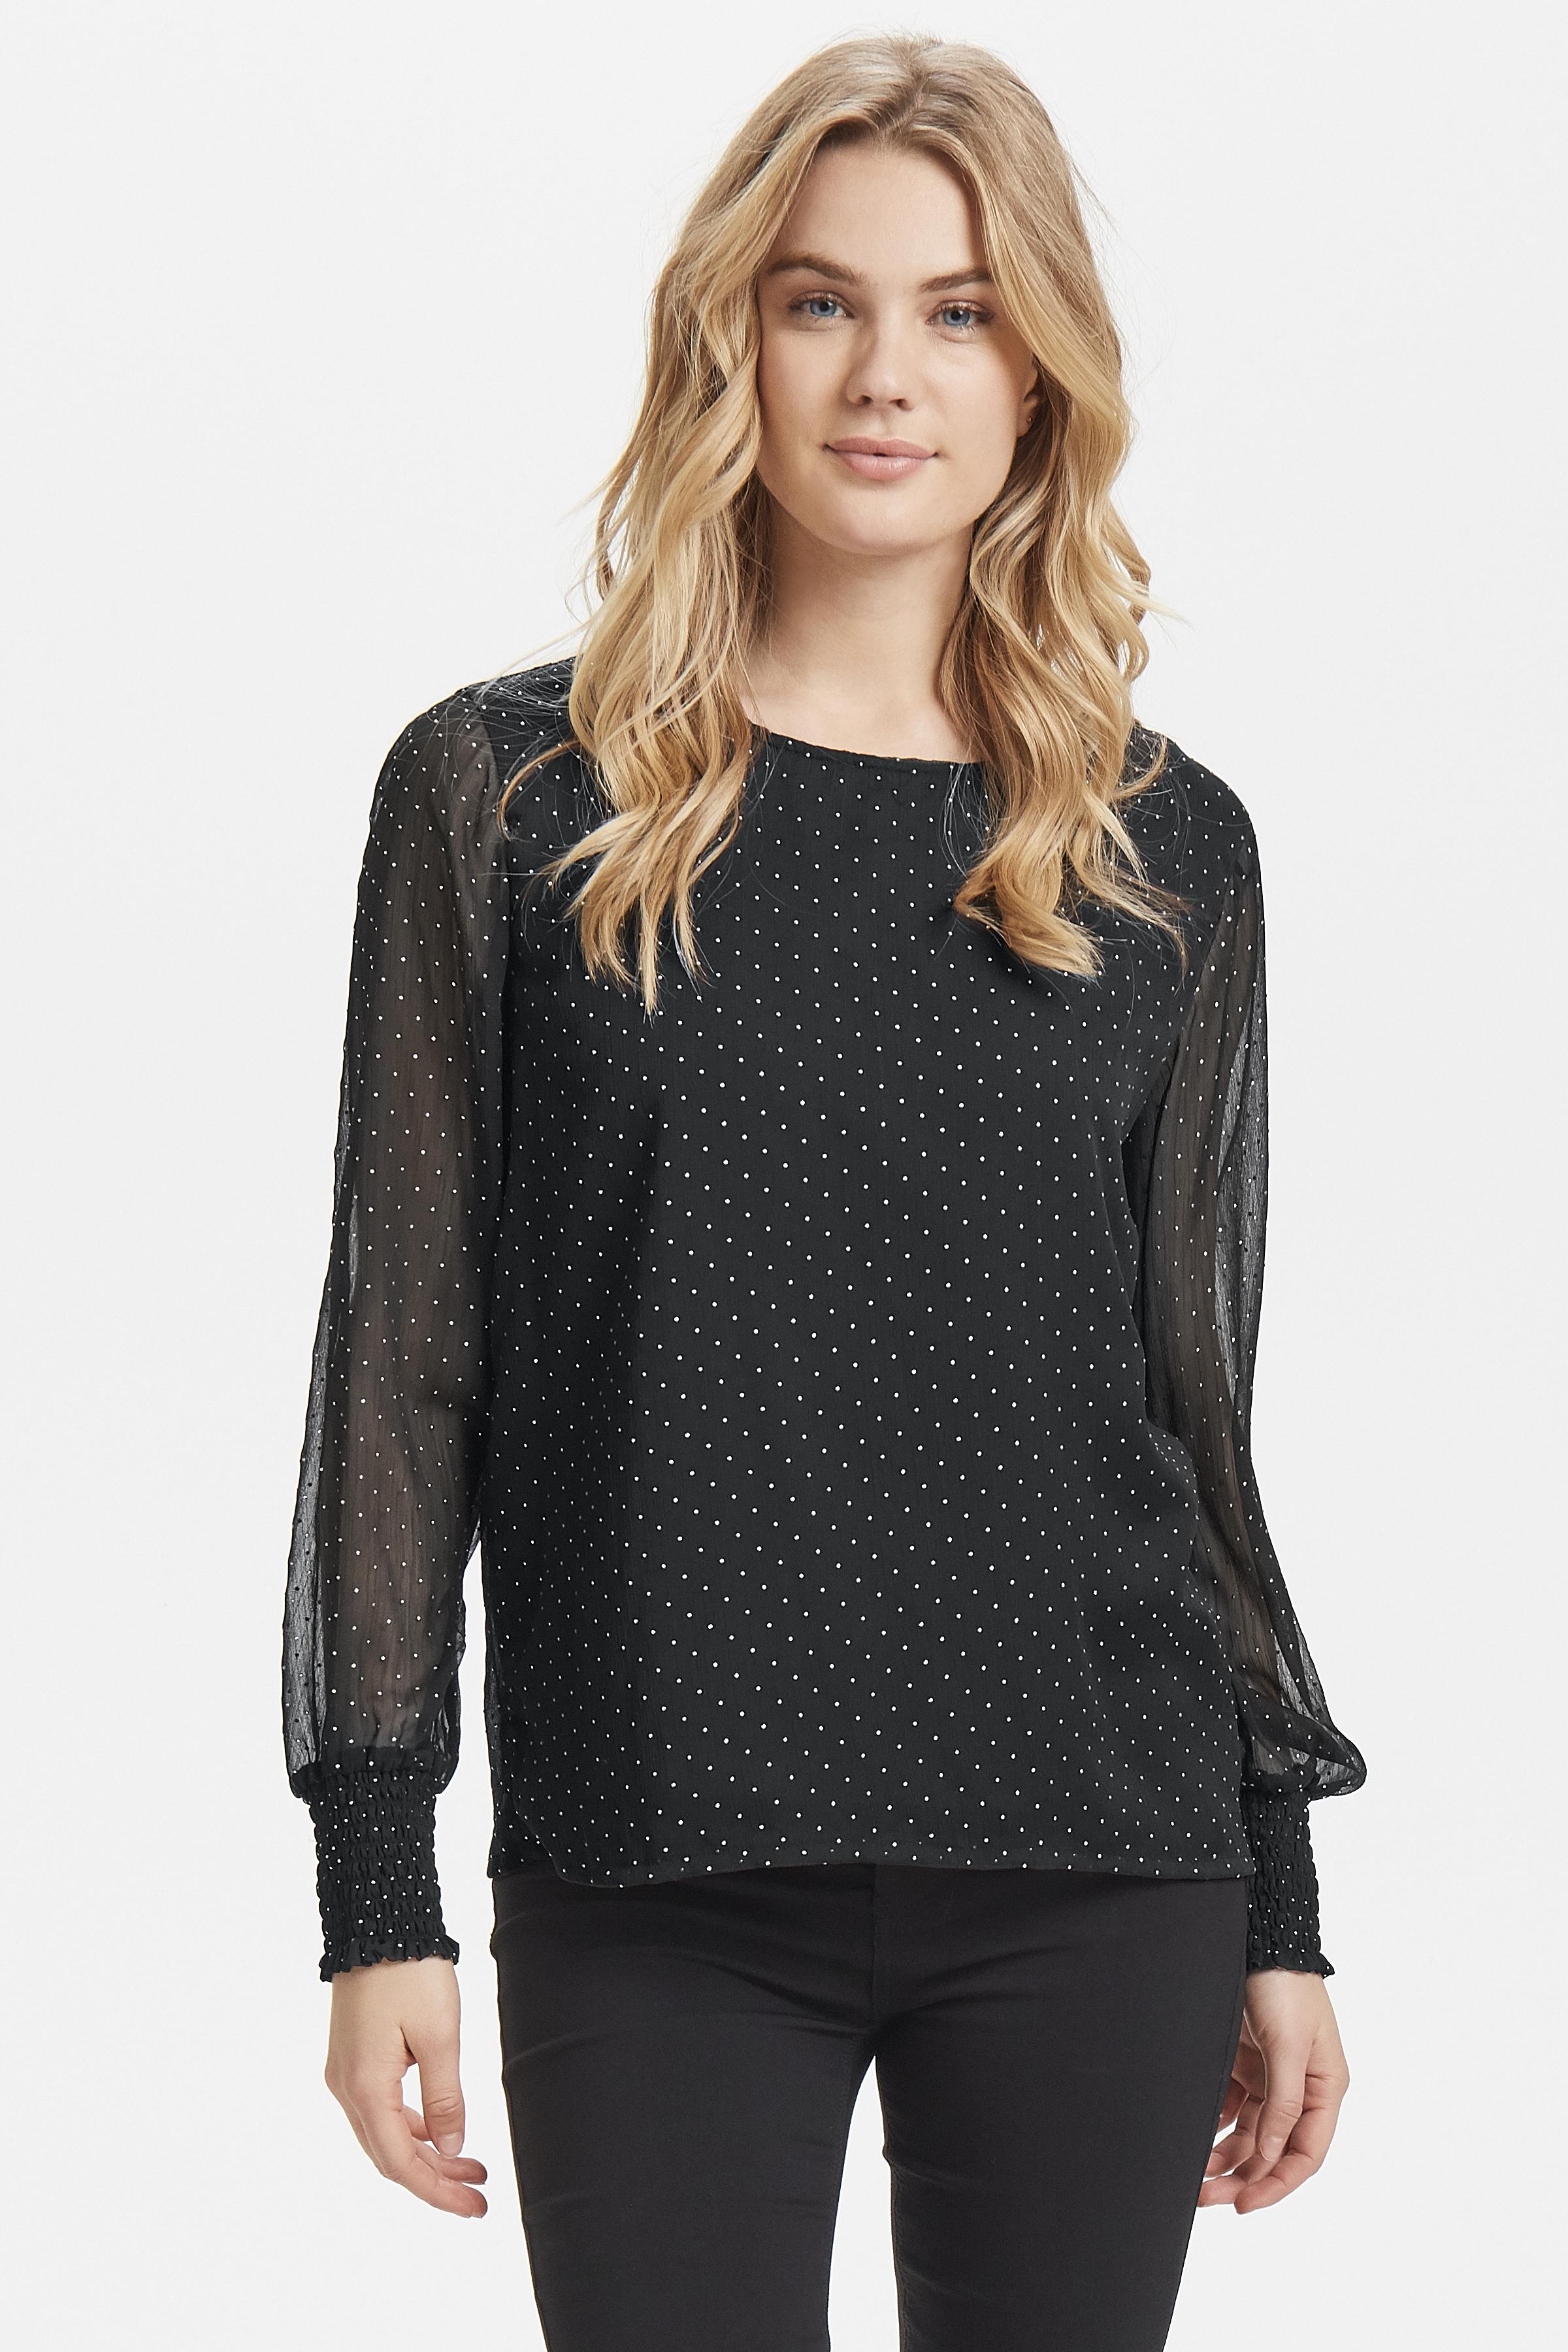 Black combi Langermet bluse fra b.young - Kjøp Black combi Langermet bluse fra størrelse 34-44 her